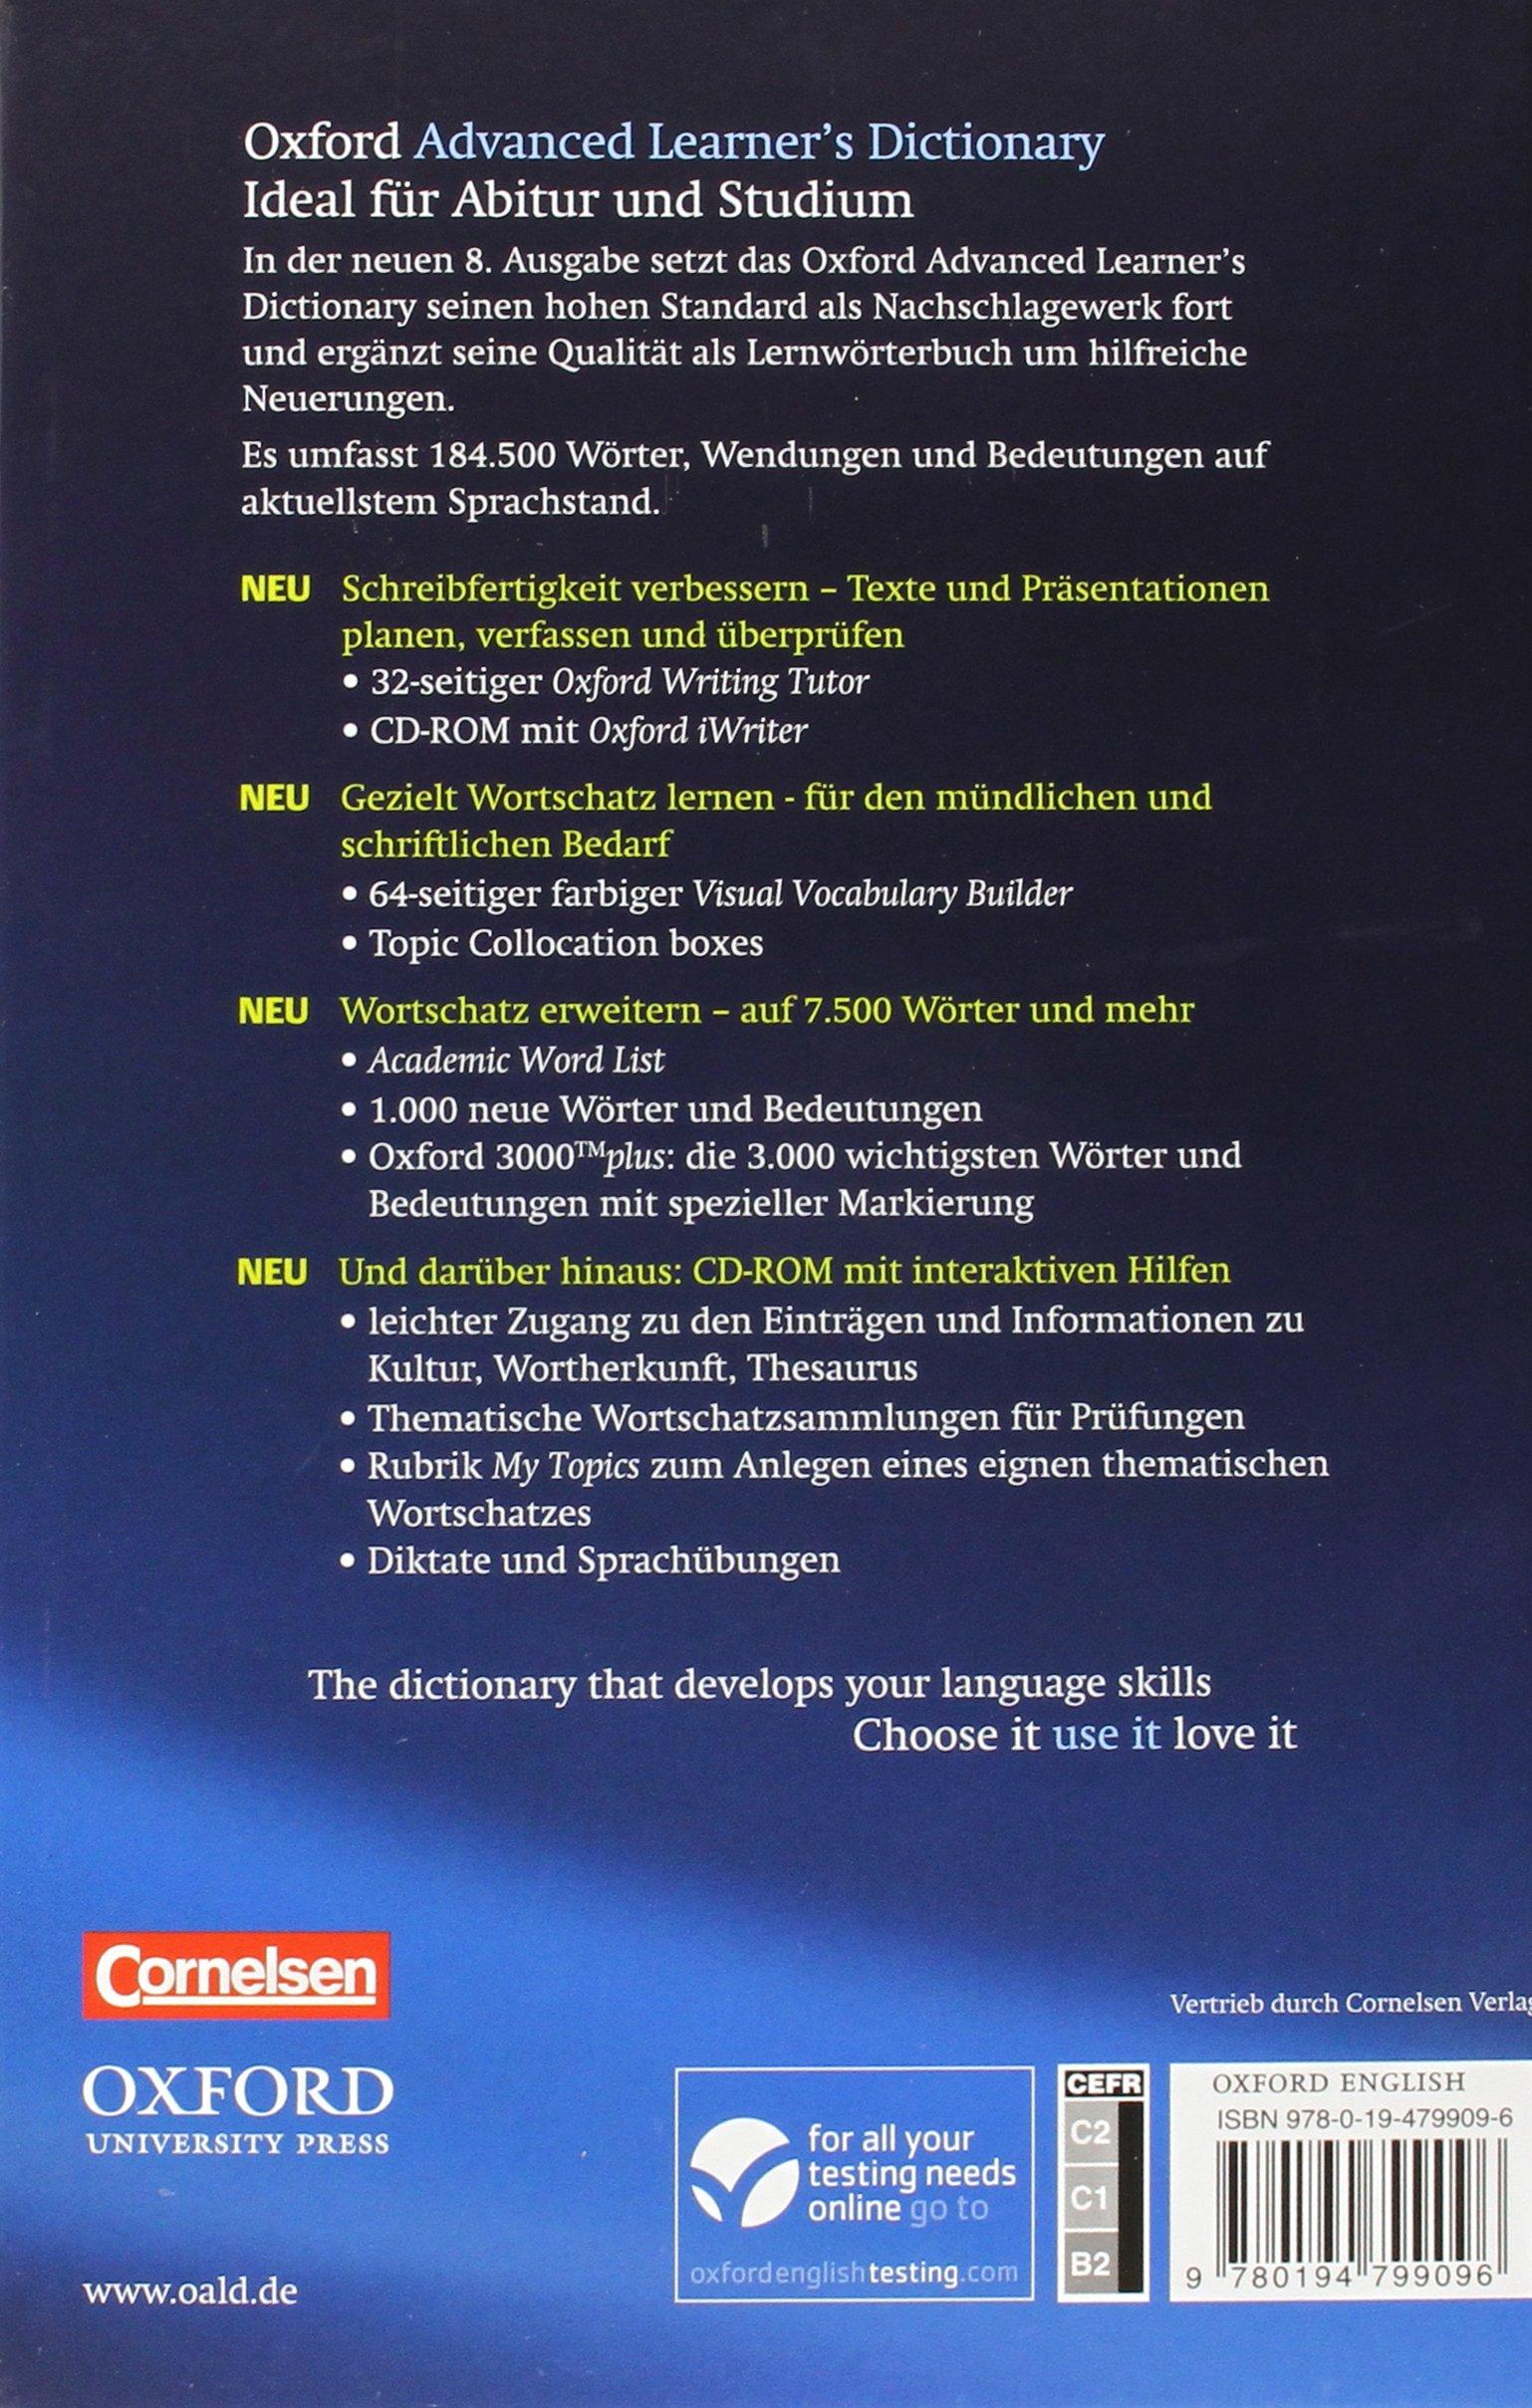 Berühmt Tutor Setzt Proben Fort Fotos - Entry Level Resume Vorlagen ...